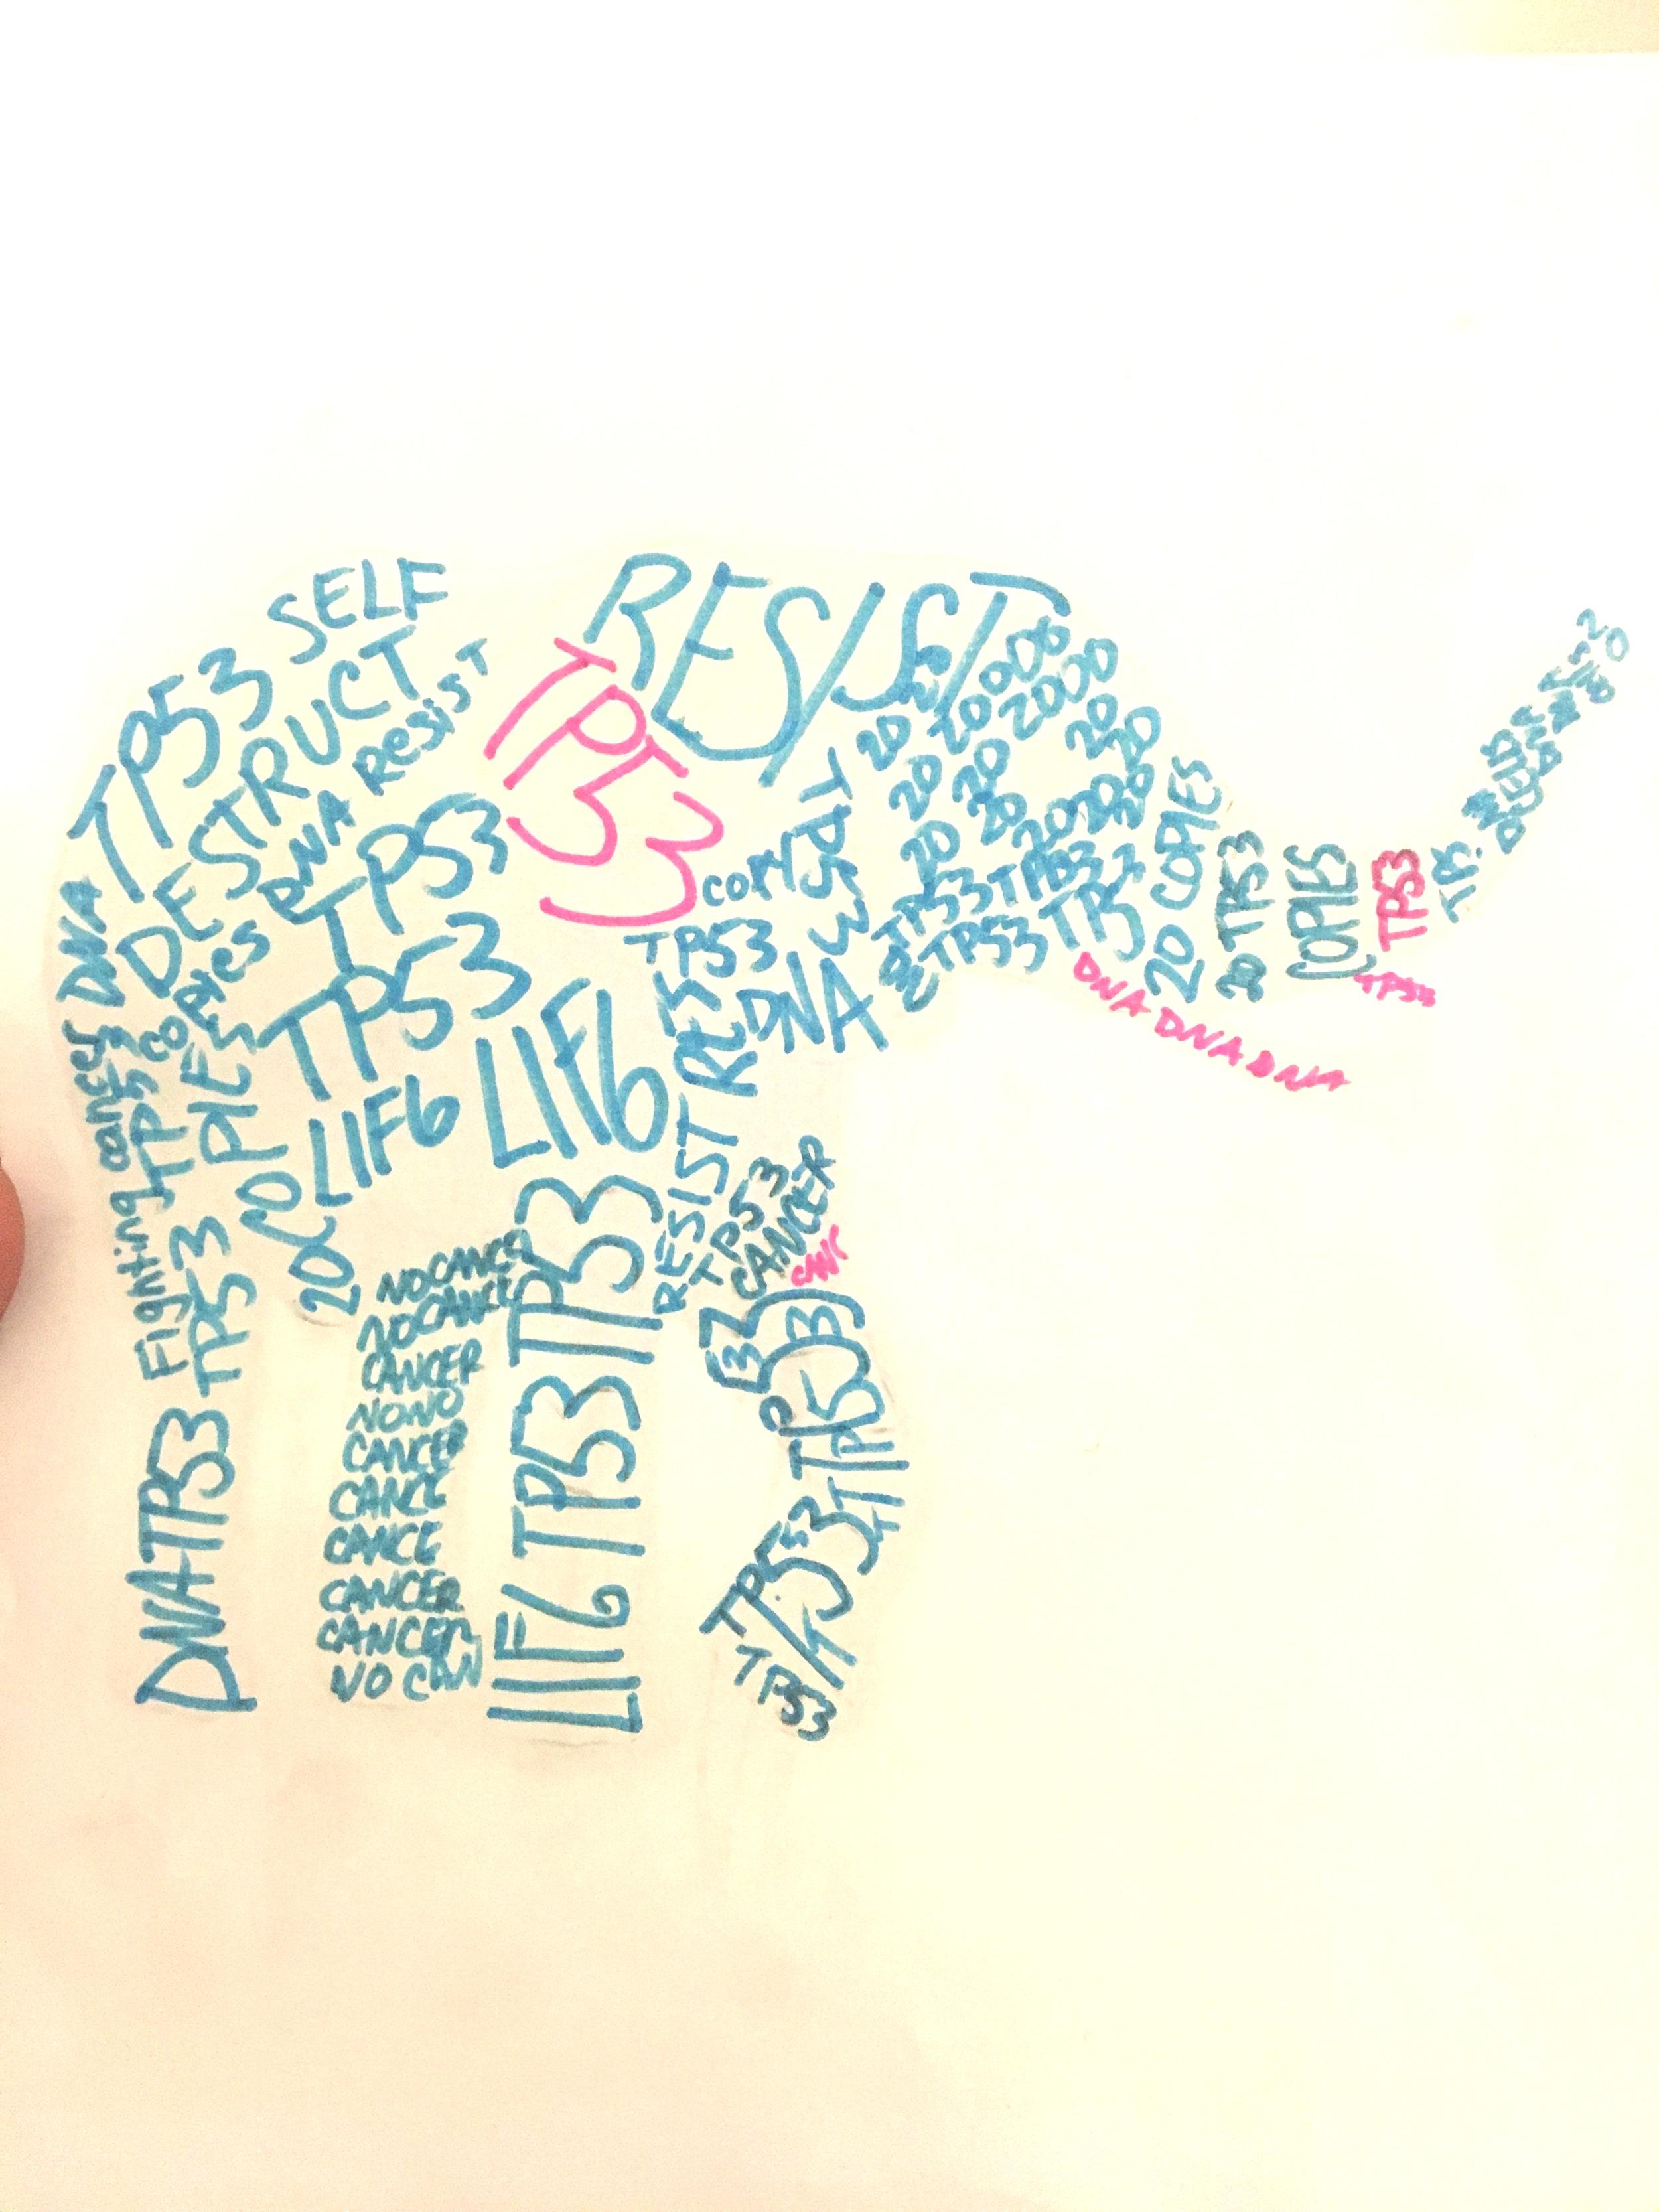 DNA Cancer TYPOGRAPHY art, STEAM class